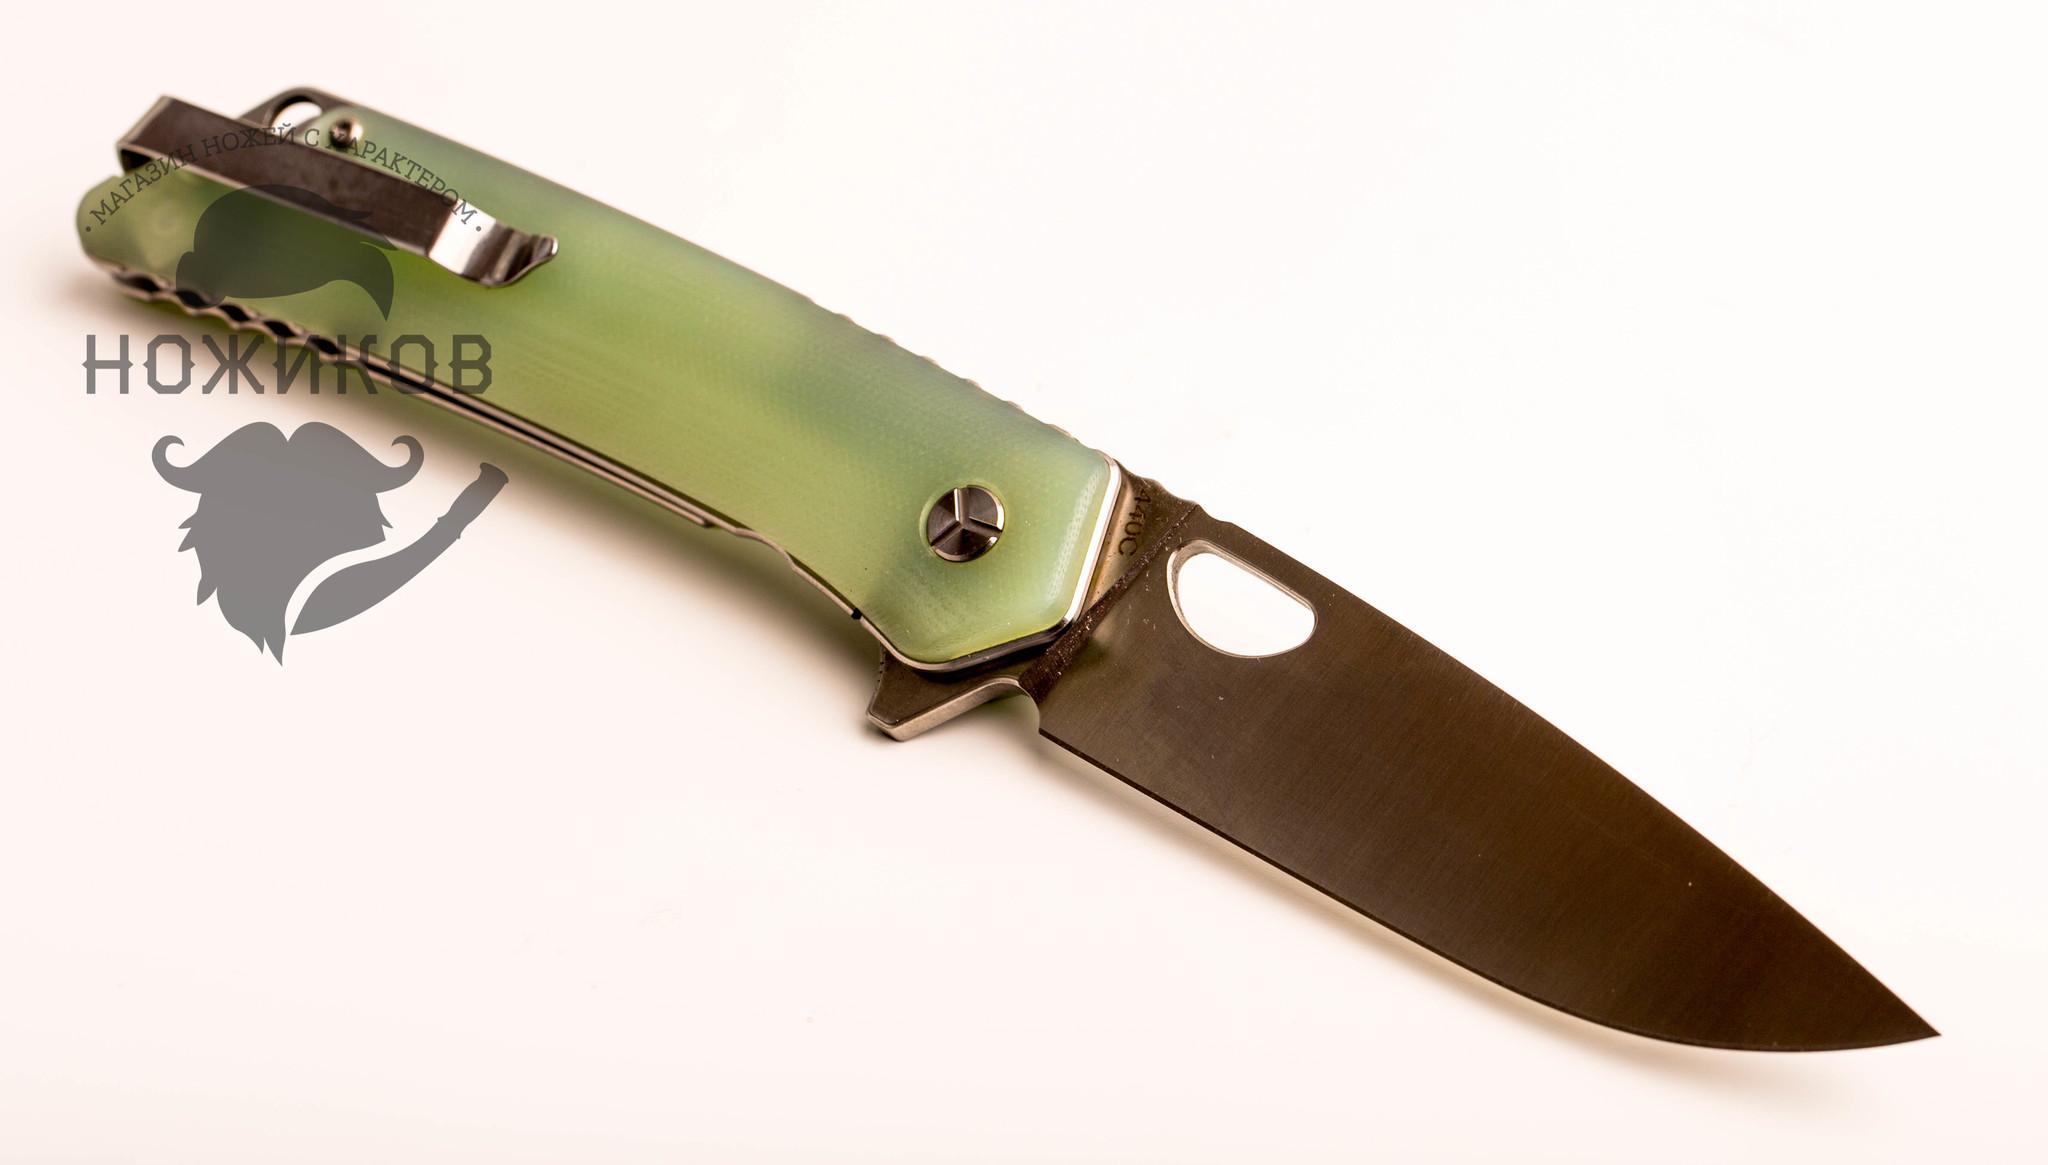 Фото 8 - Складной нож lk5016gr от Steelclaw